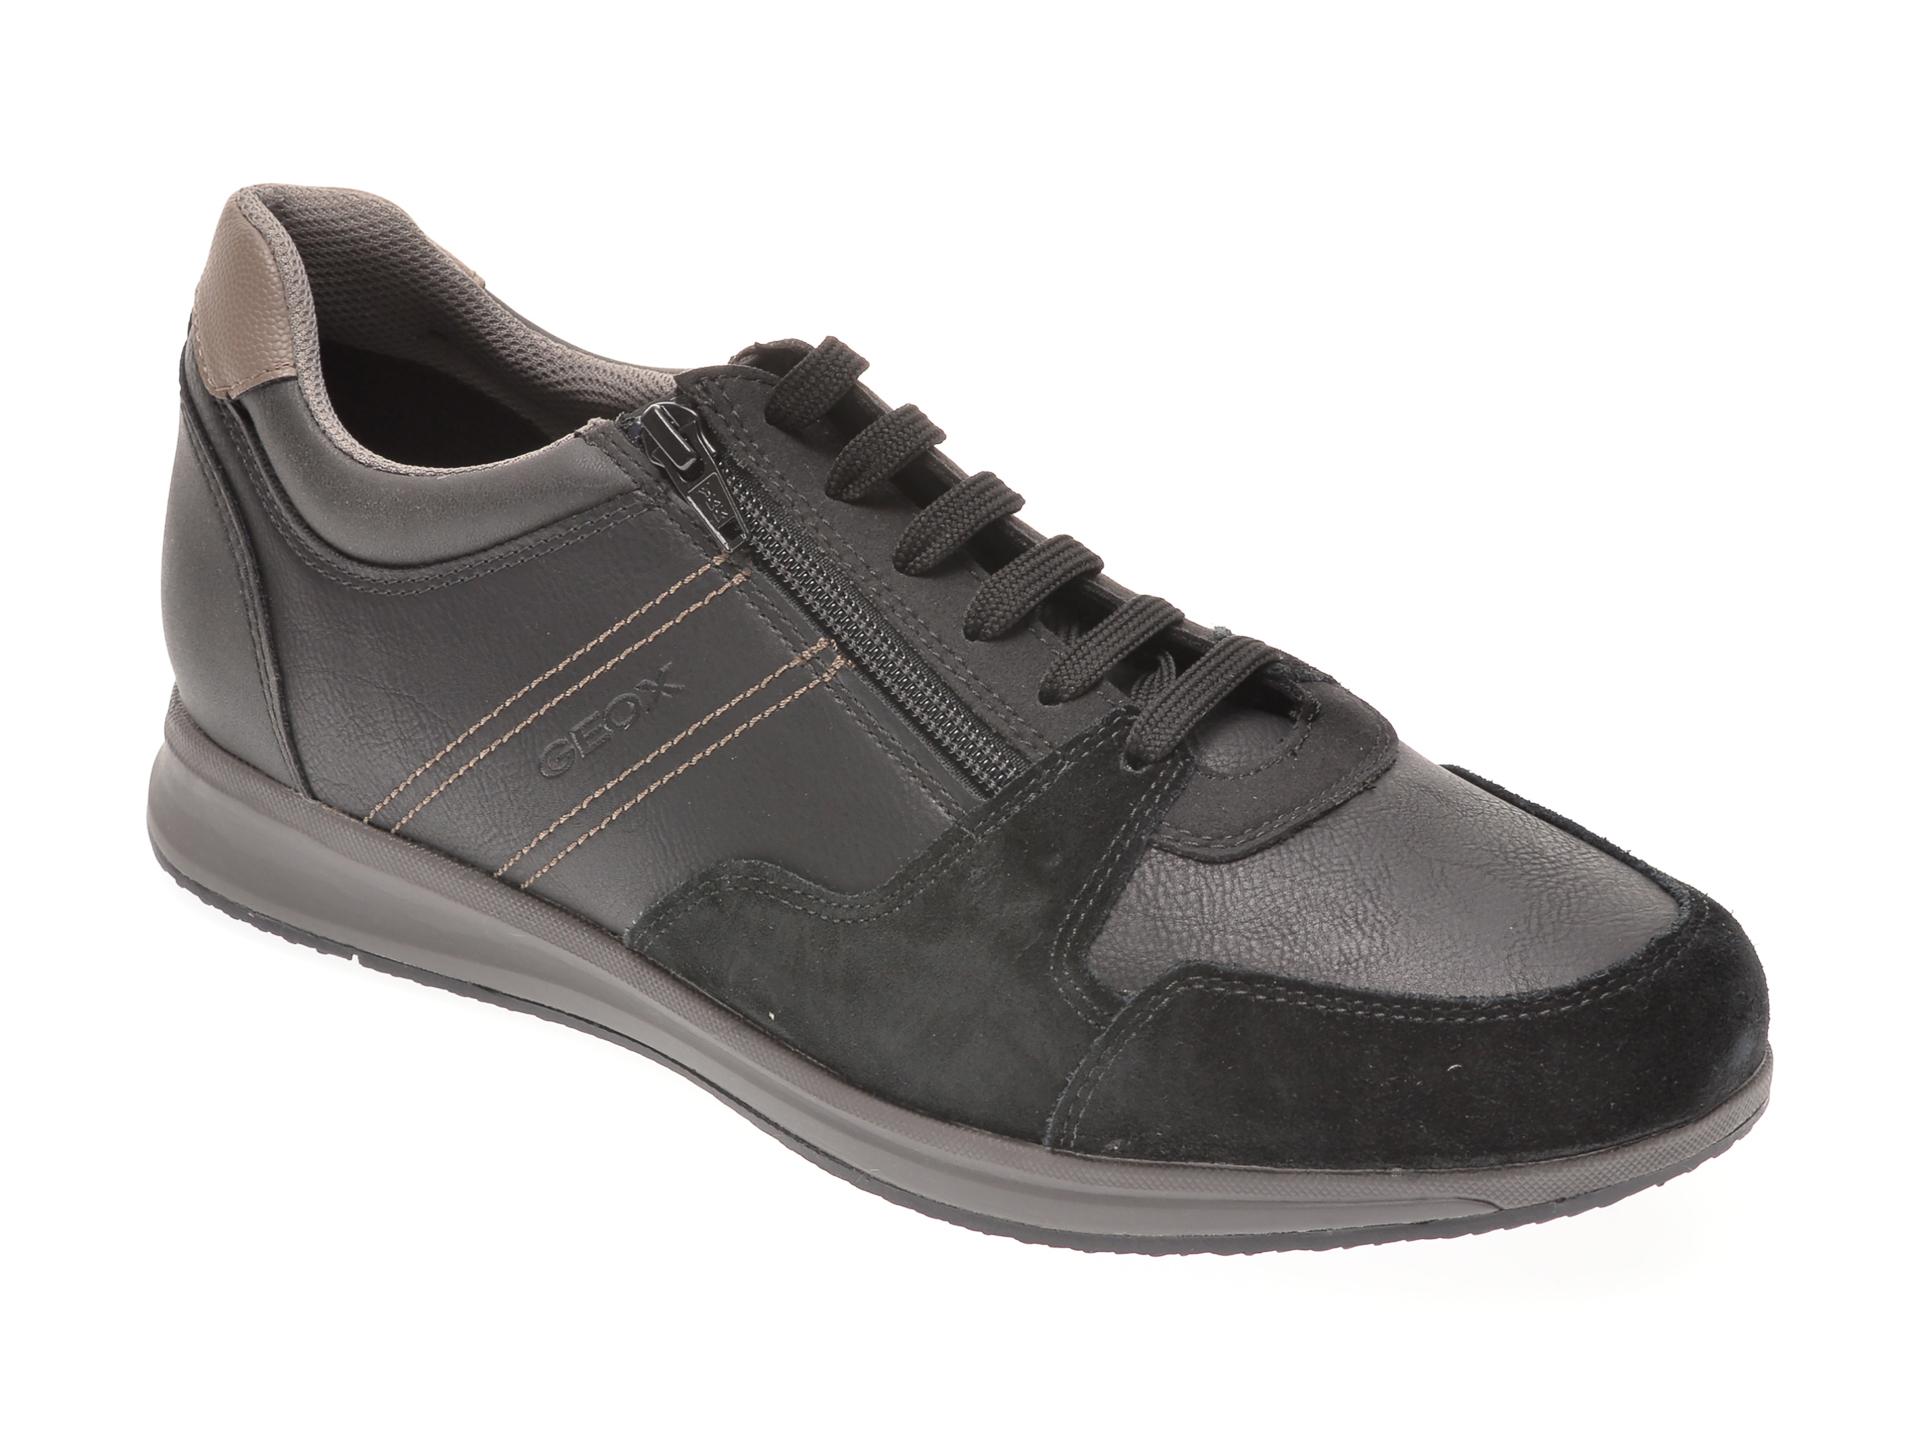 Pantofi GEOX negri, U02H5B, din piele ecologica